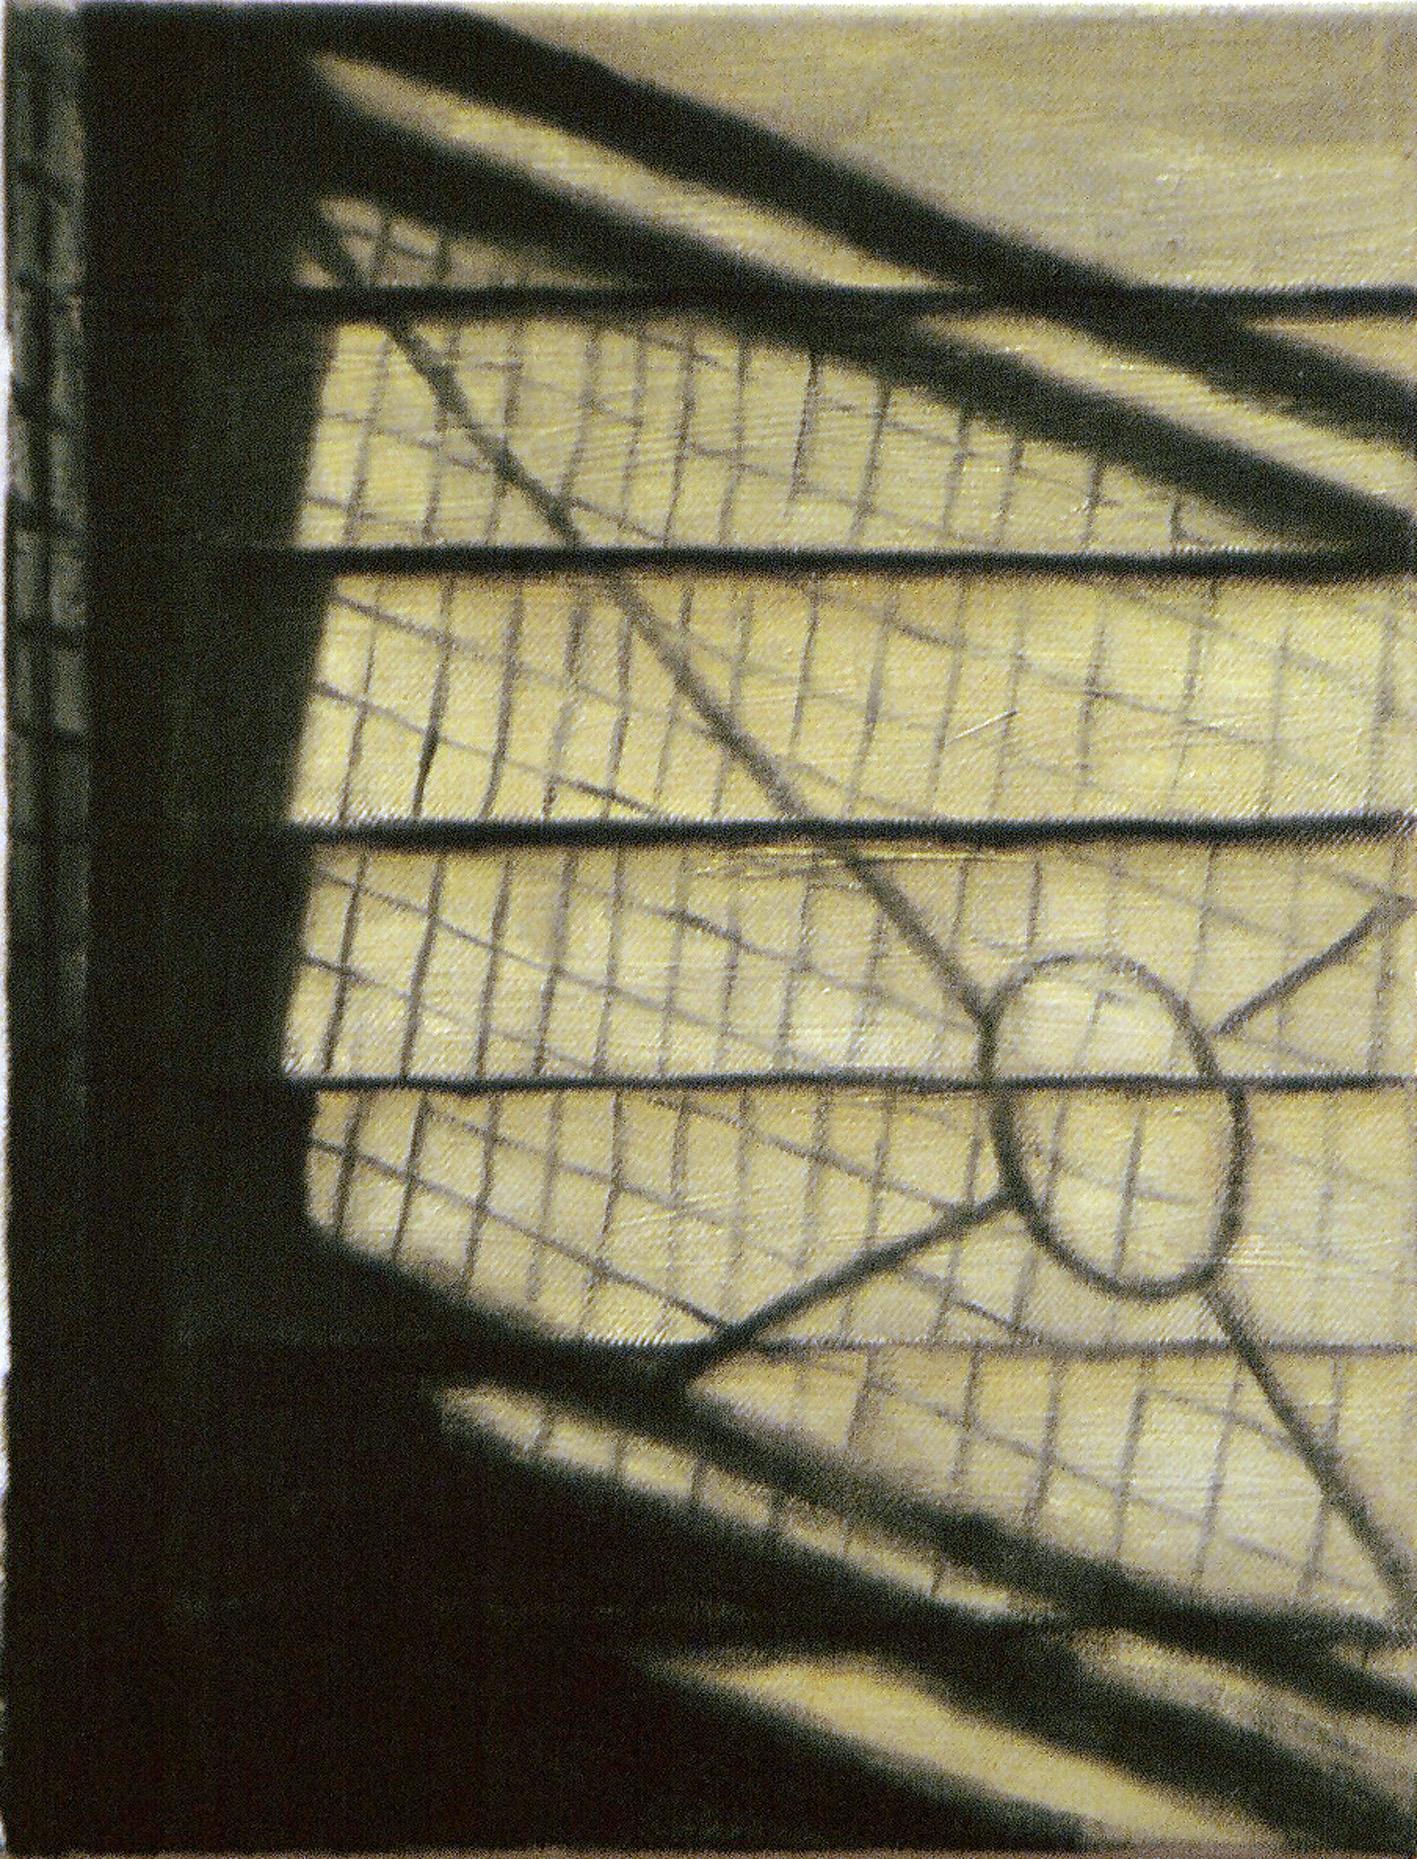 Exterior from Taivallahti  Oil on canvas  35 x 27 cm  2004